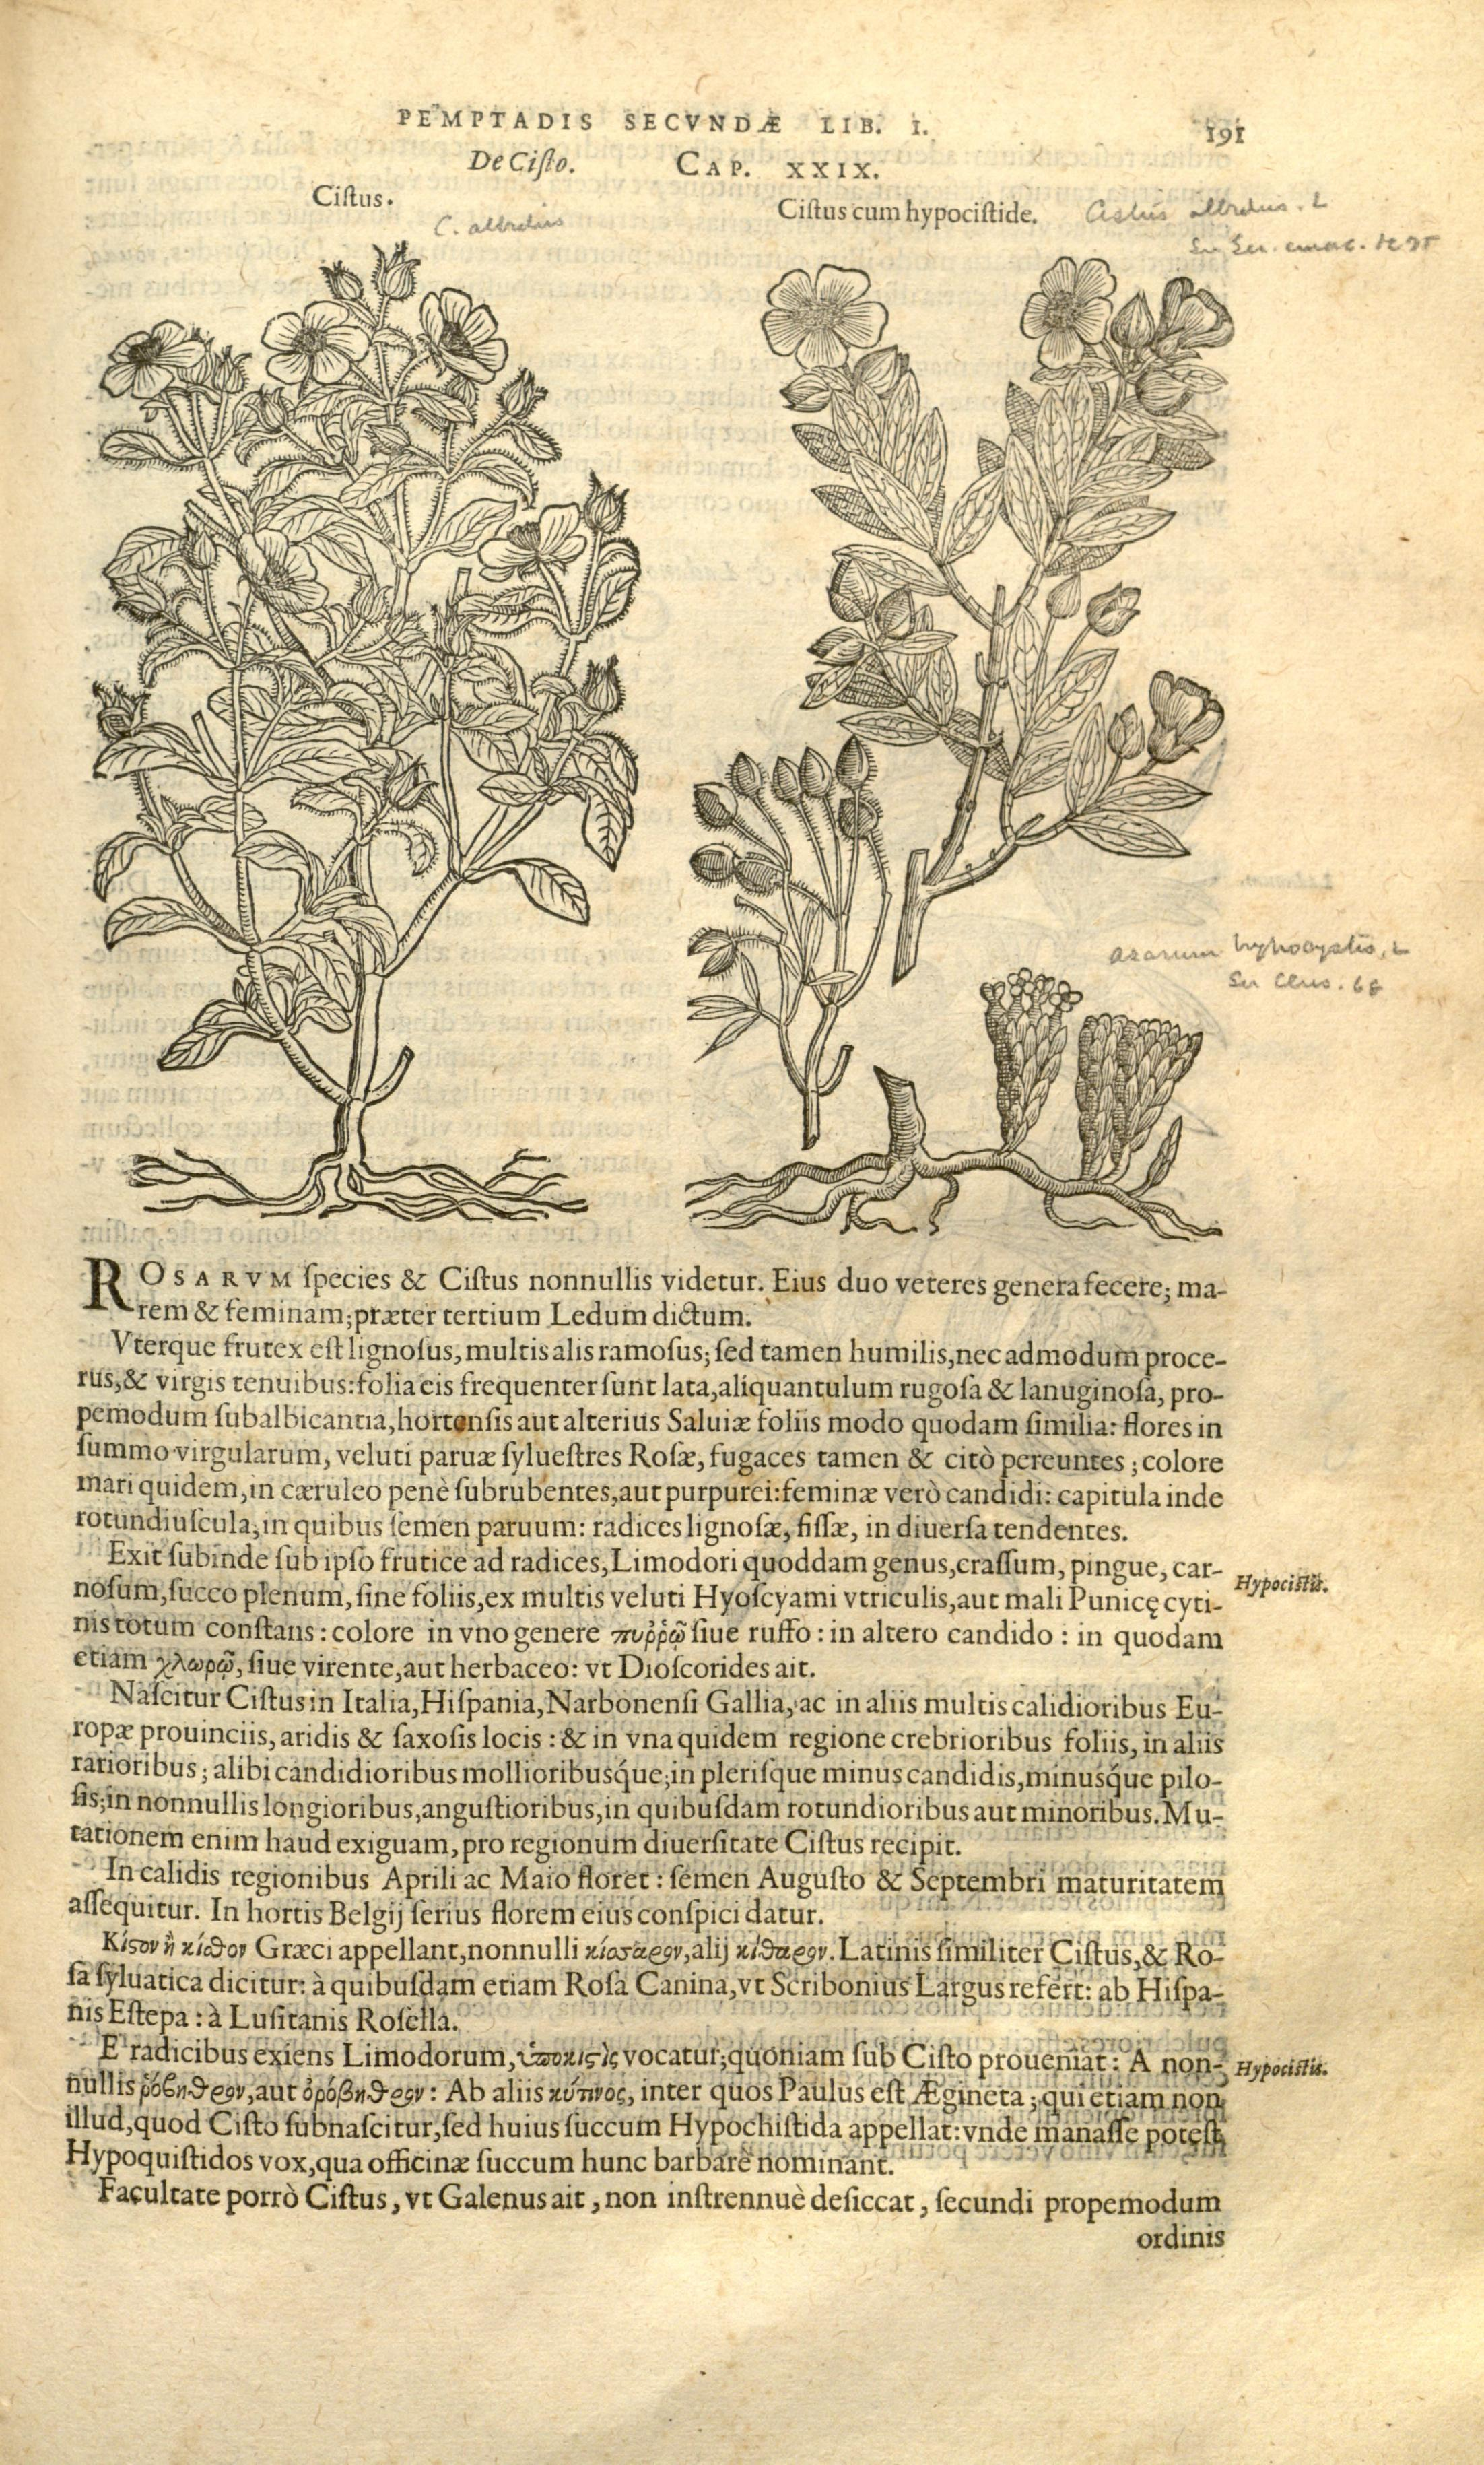 Stirpium historiae pemptades sex, sive libri XXX (Page 191) BHL8099850.jpg Remberti Dodonaei ... Stirpium historiae pemptades sex, sive libri XXX. Date 1583